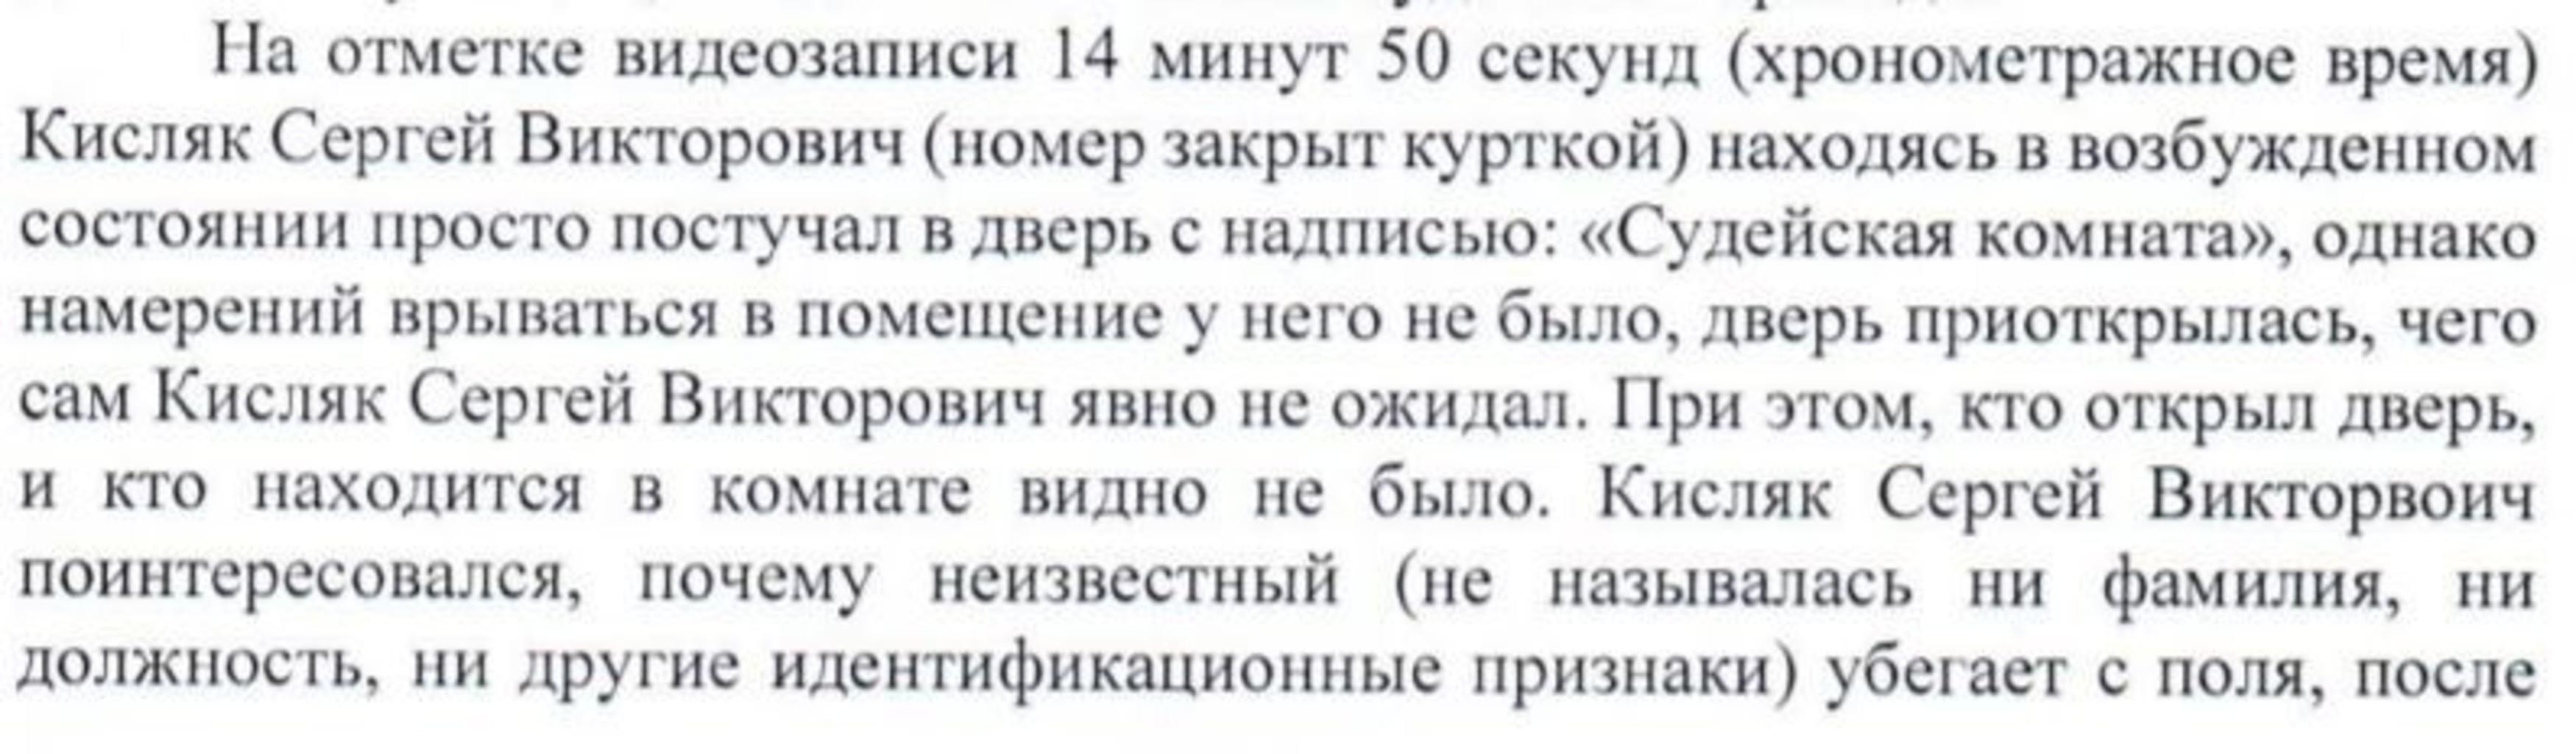 Kisl3 14